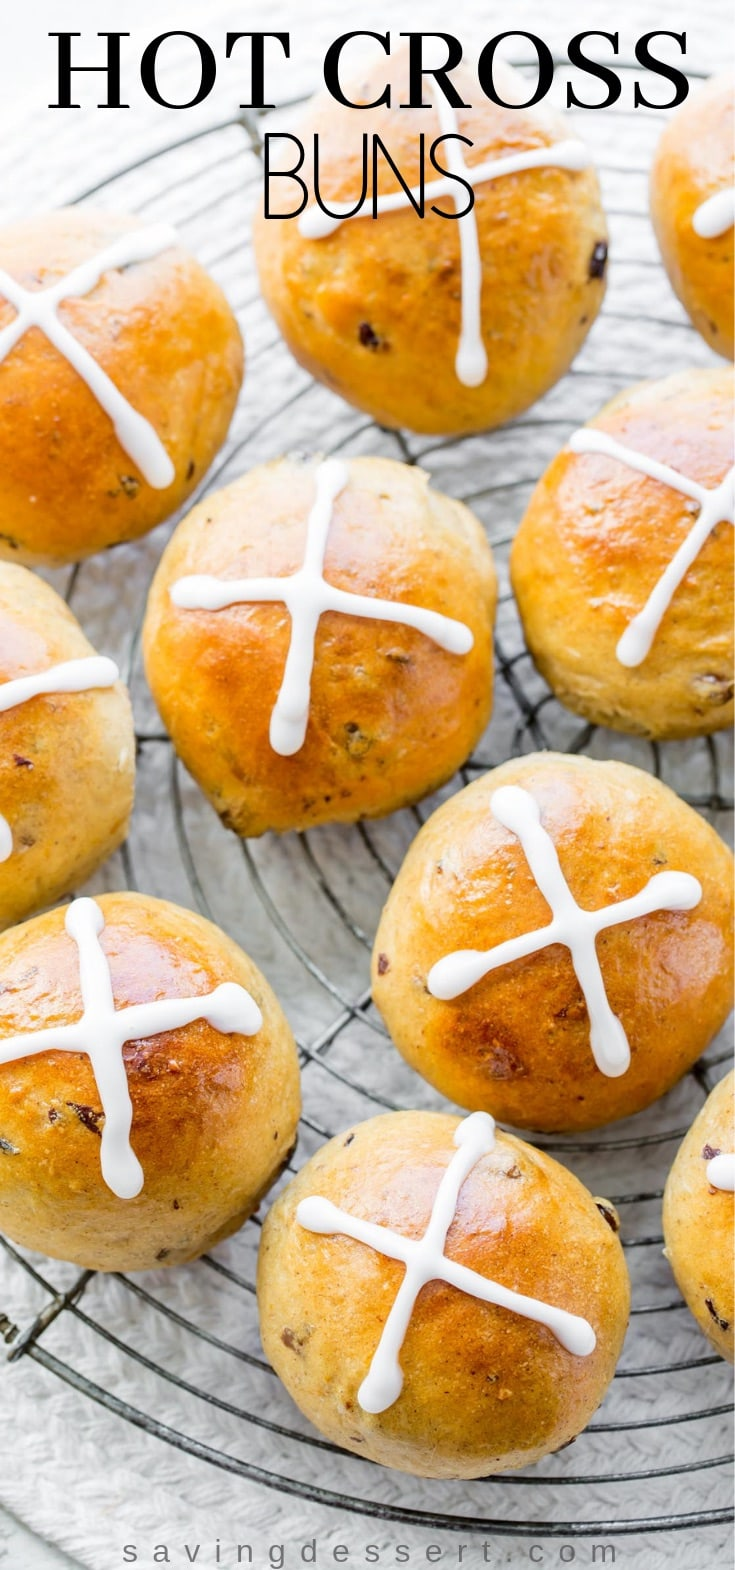 Hot Cross Buns - lightly sweet, orange scented yeast rolls with currants, raisins and plenty of warm spices. #hotcrossbuns #sweetbuns #buns #hotcross #easter #brunch #raisinrolls #holidaybaking